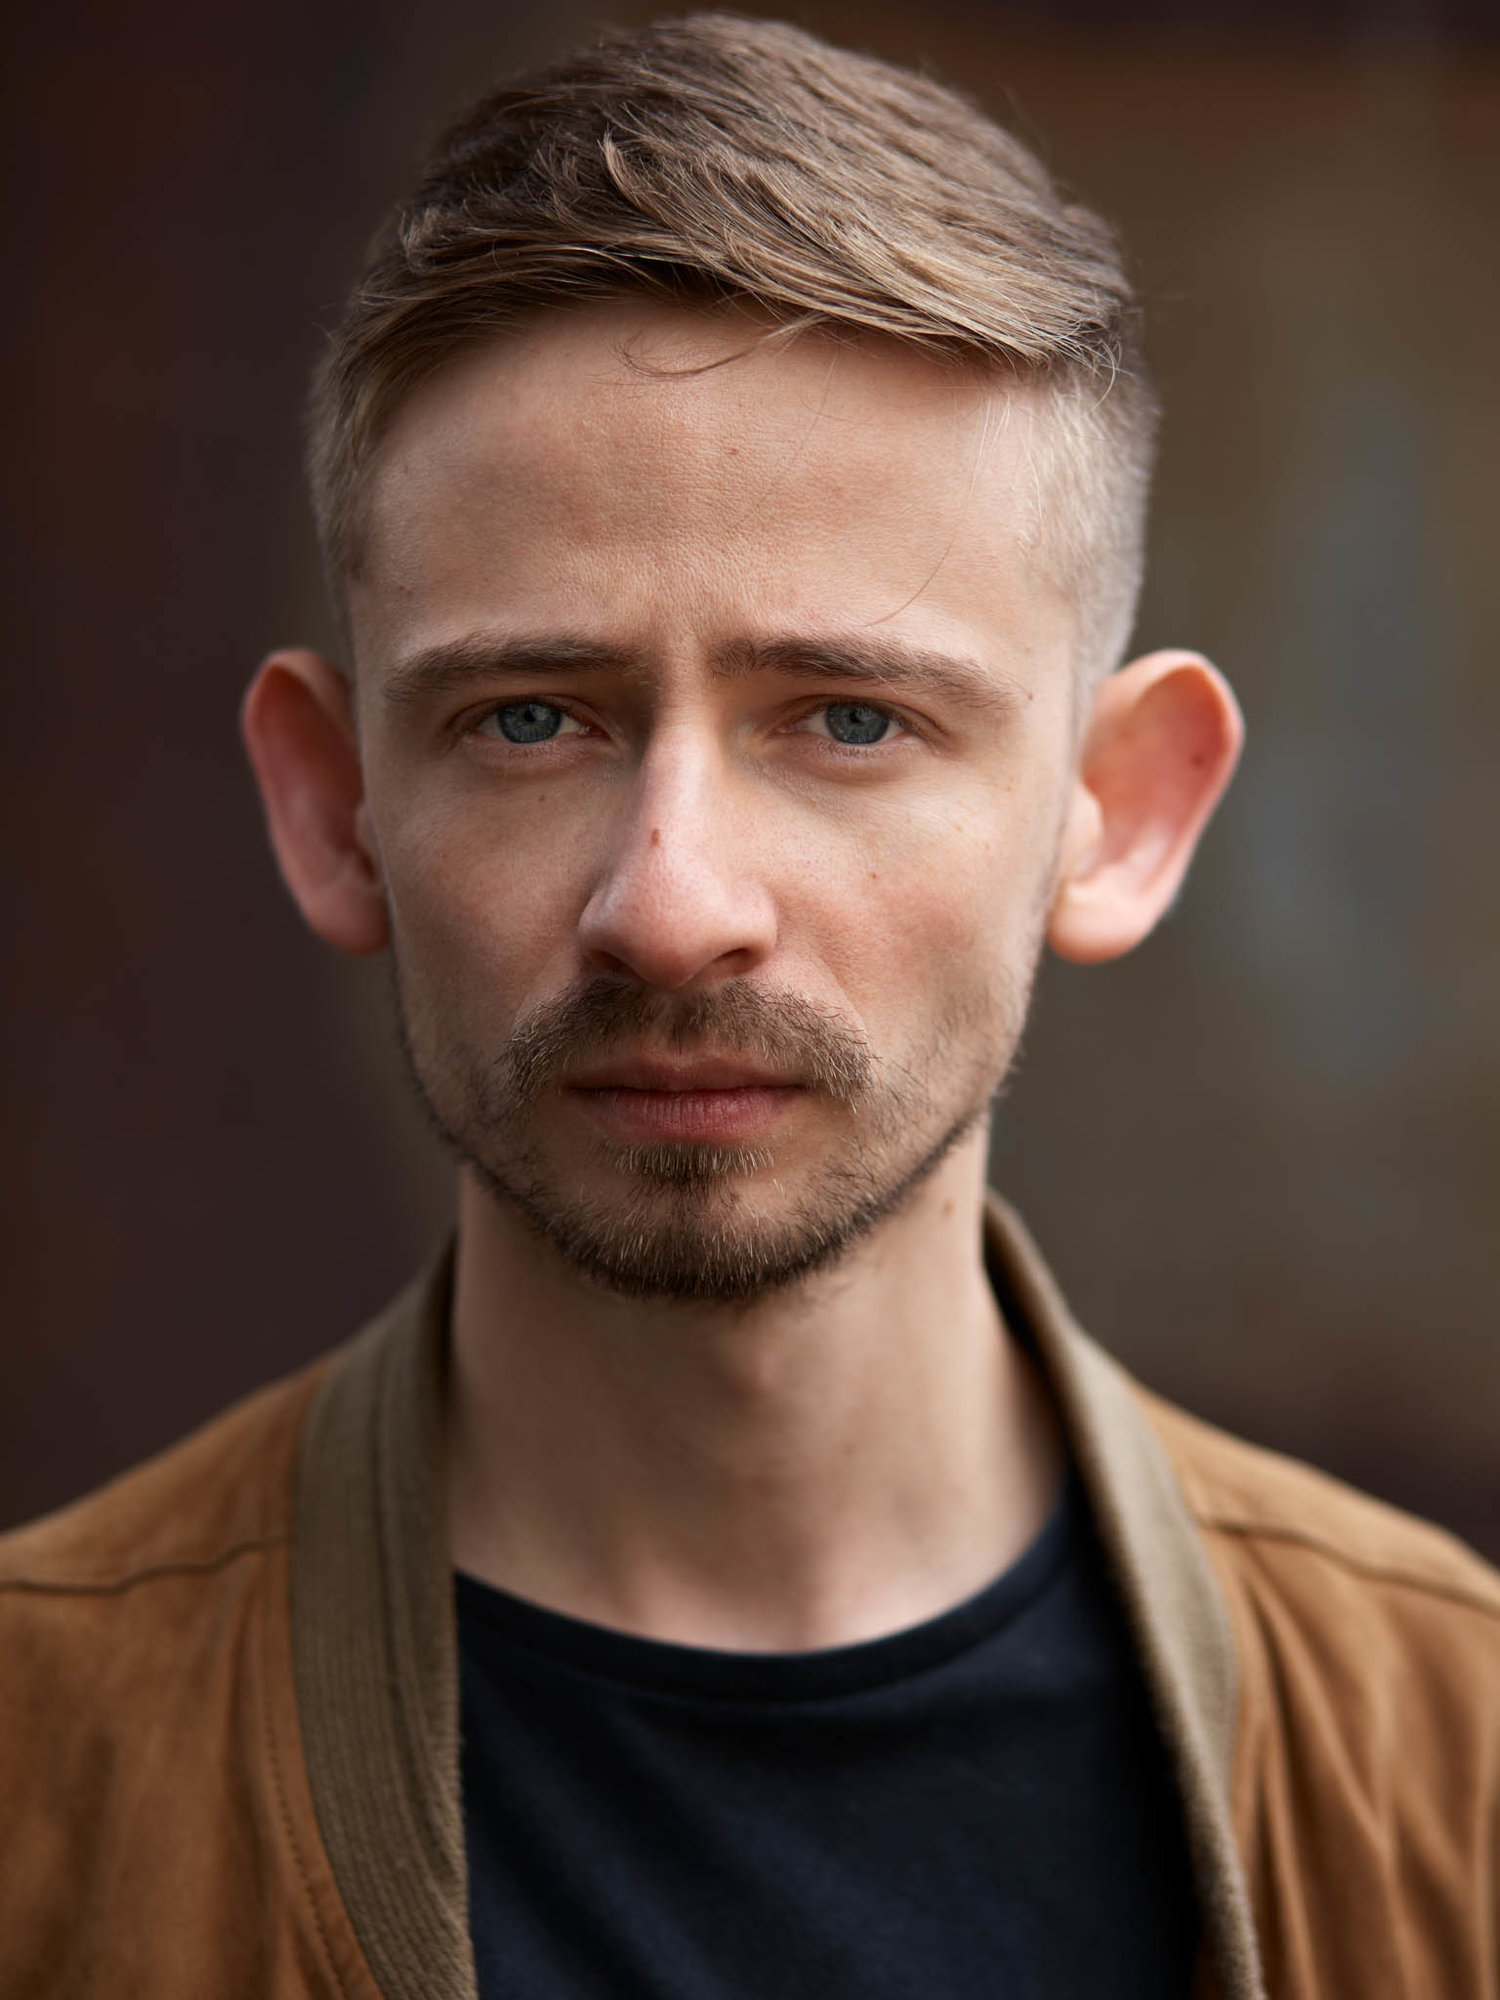 tom-hardman-actor-03+-+Web+Size.jpg